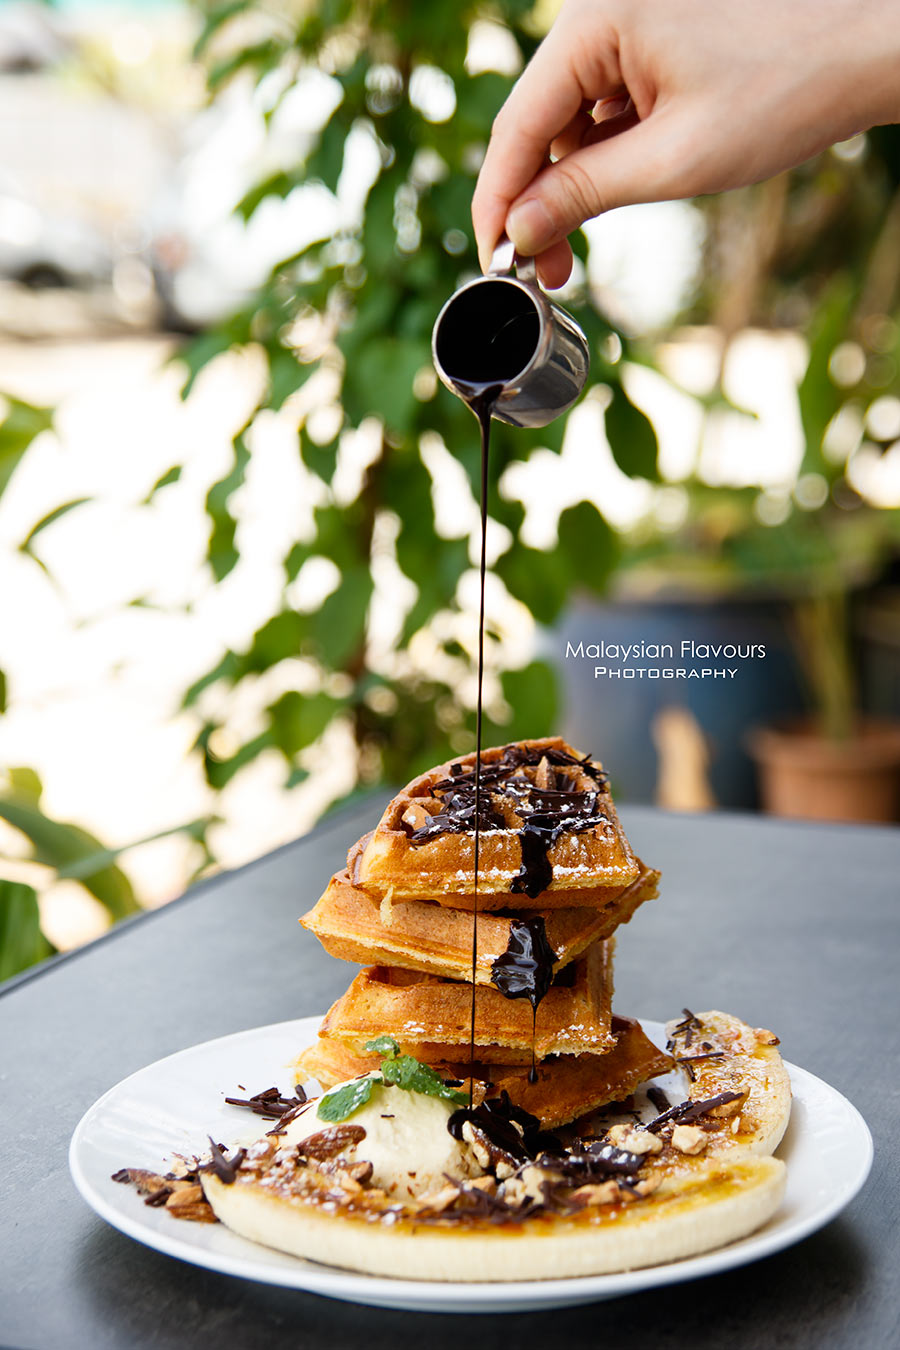 the-prep-room-sri-hartamas-kl-cafe-with-hand-drawn-food-menu